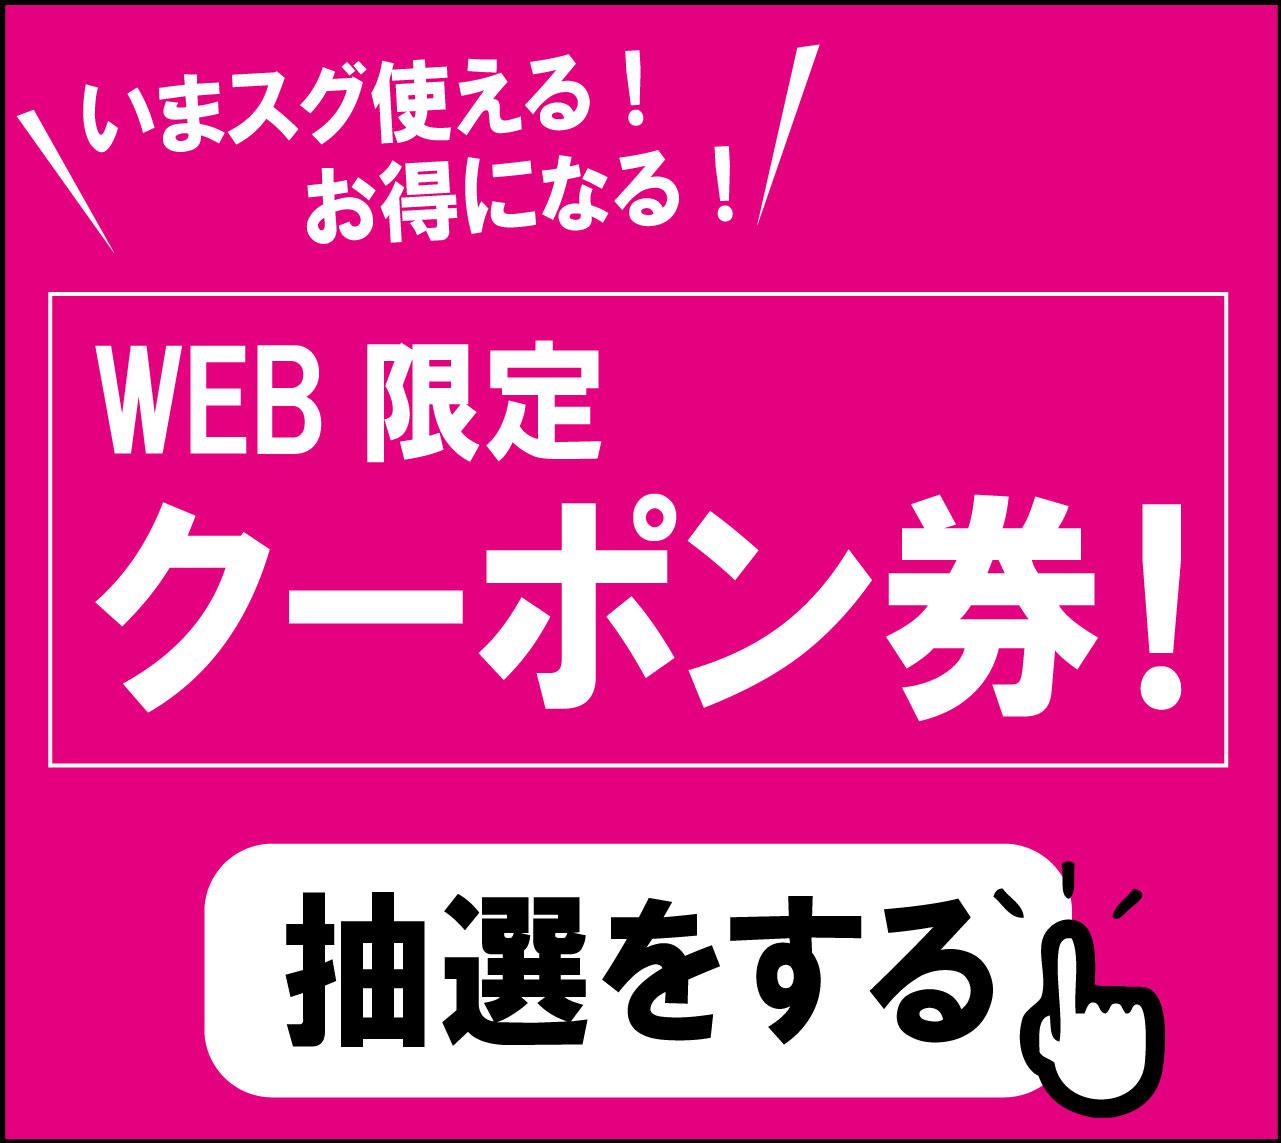 WEB限定 クーポン券